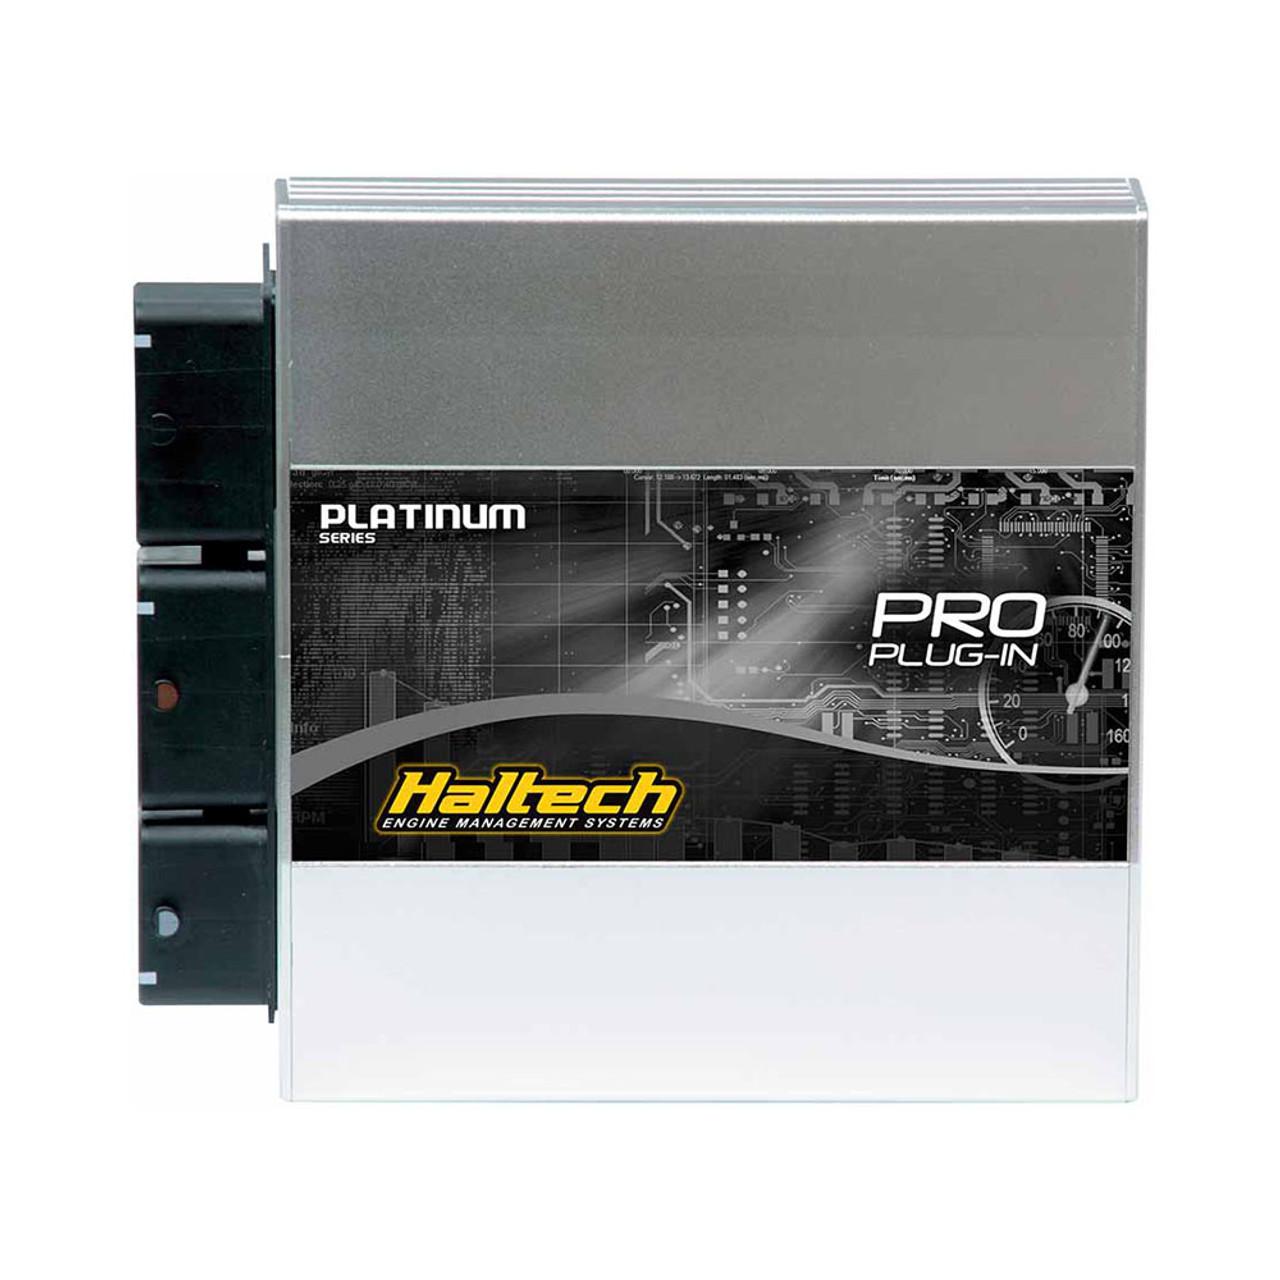 Haltech Ecu